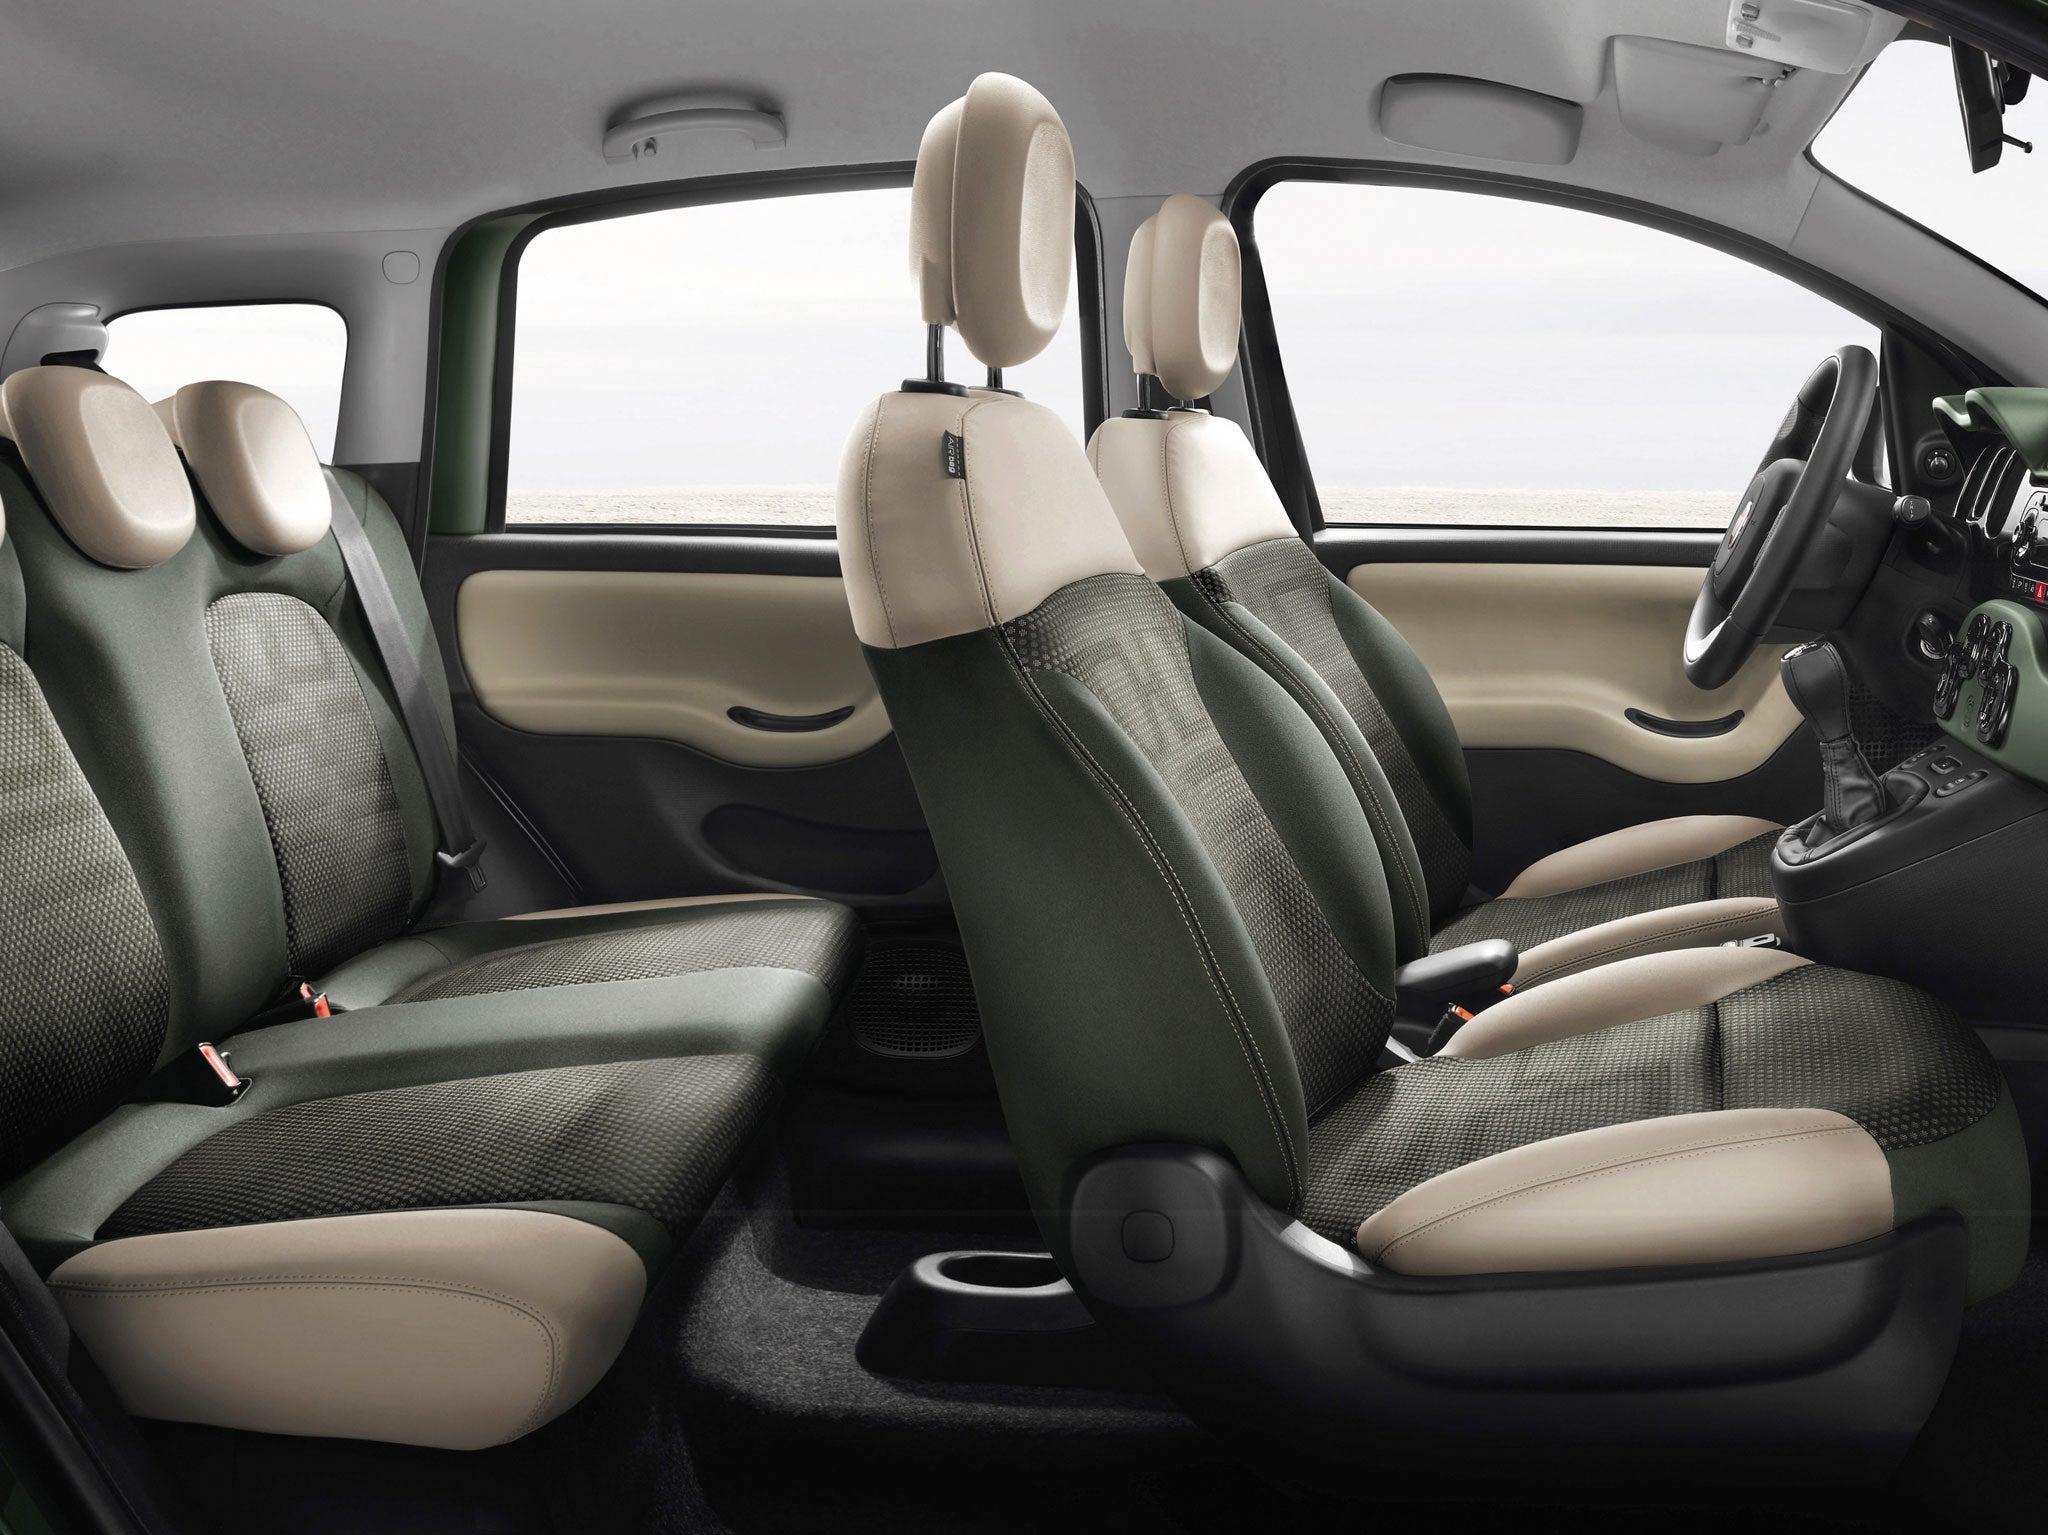 Motoring review: Fiat Panda 4x4 TwinAir | The Independent